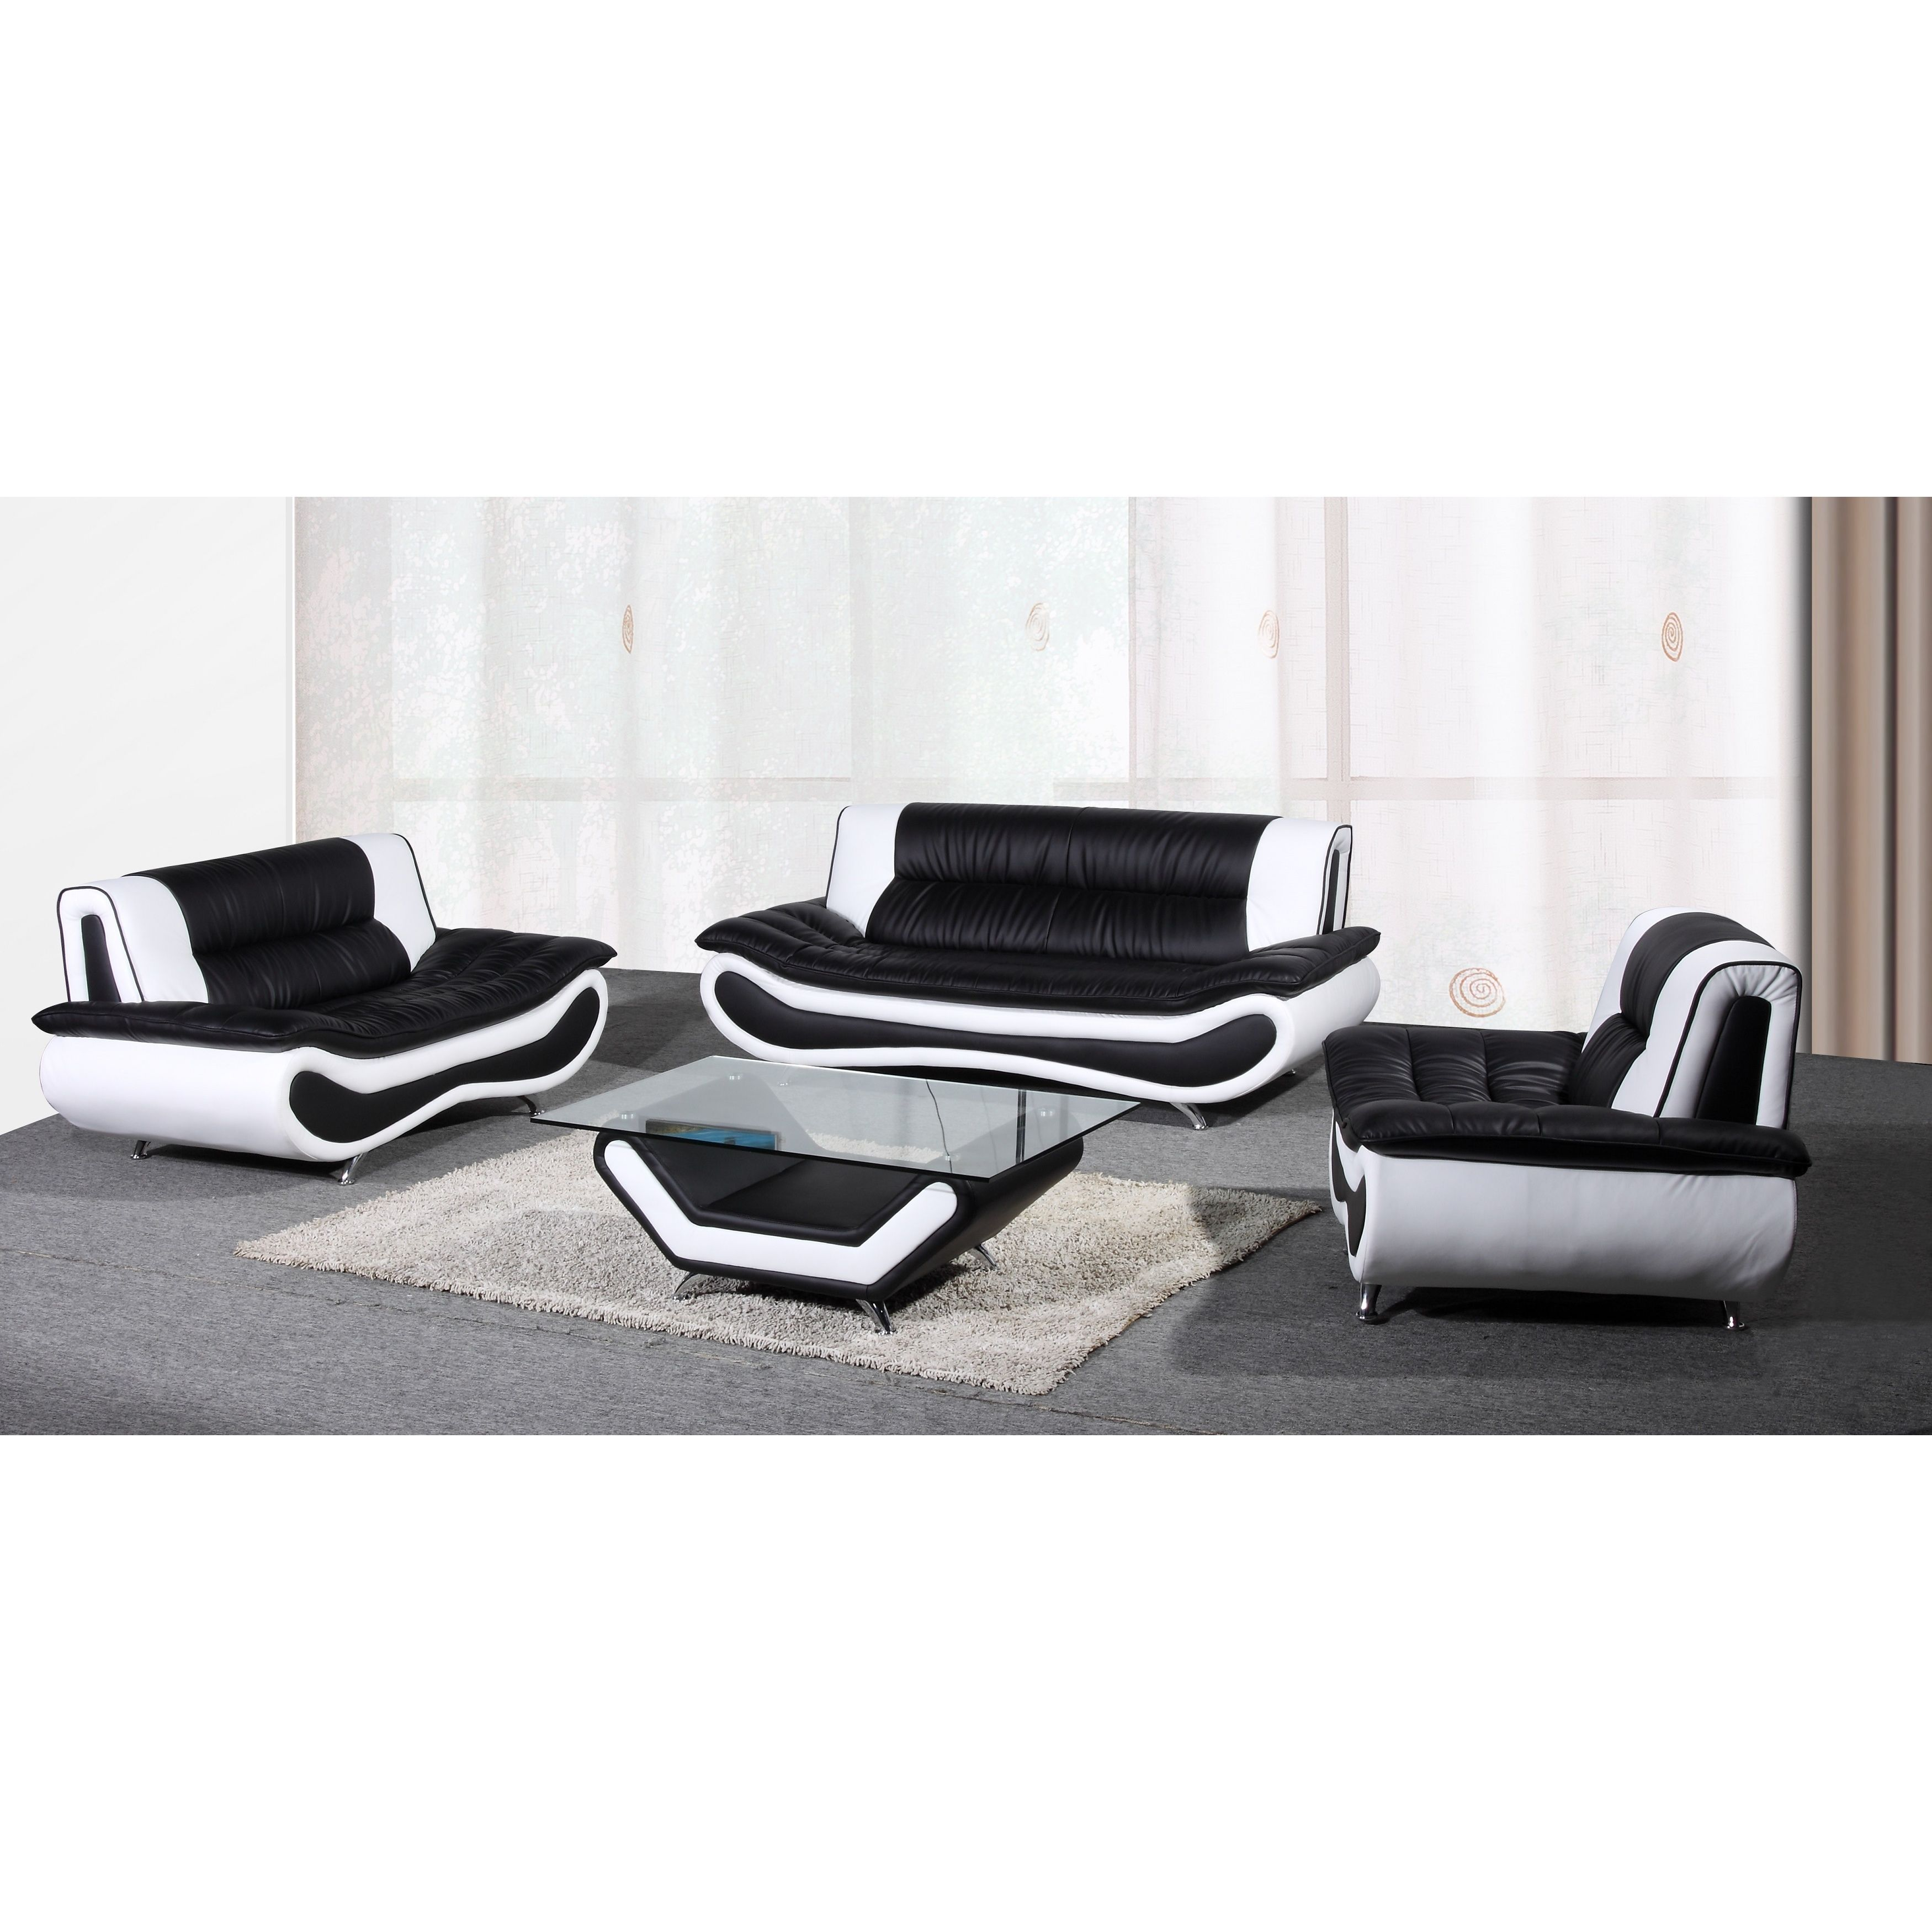 Living Packages Package Deals Fantastic Furniture